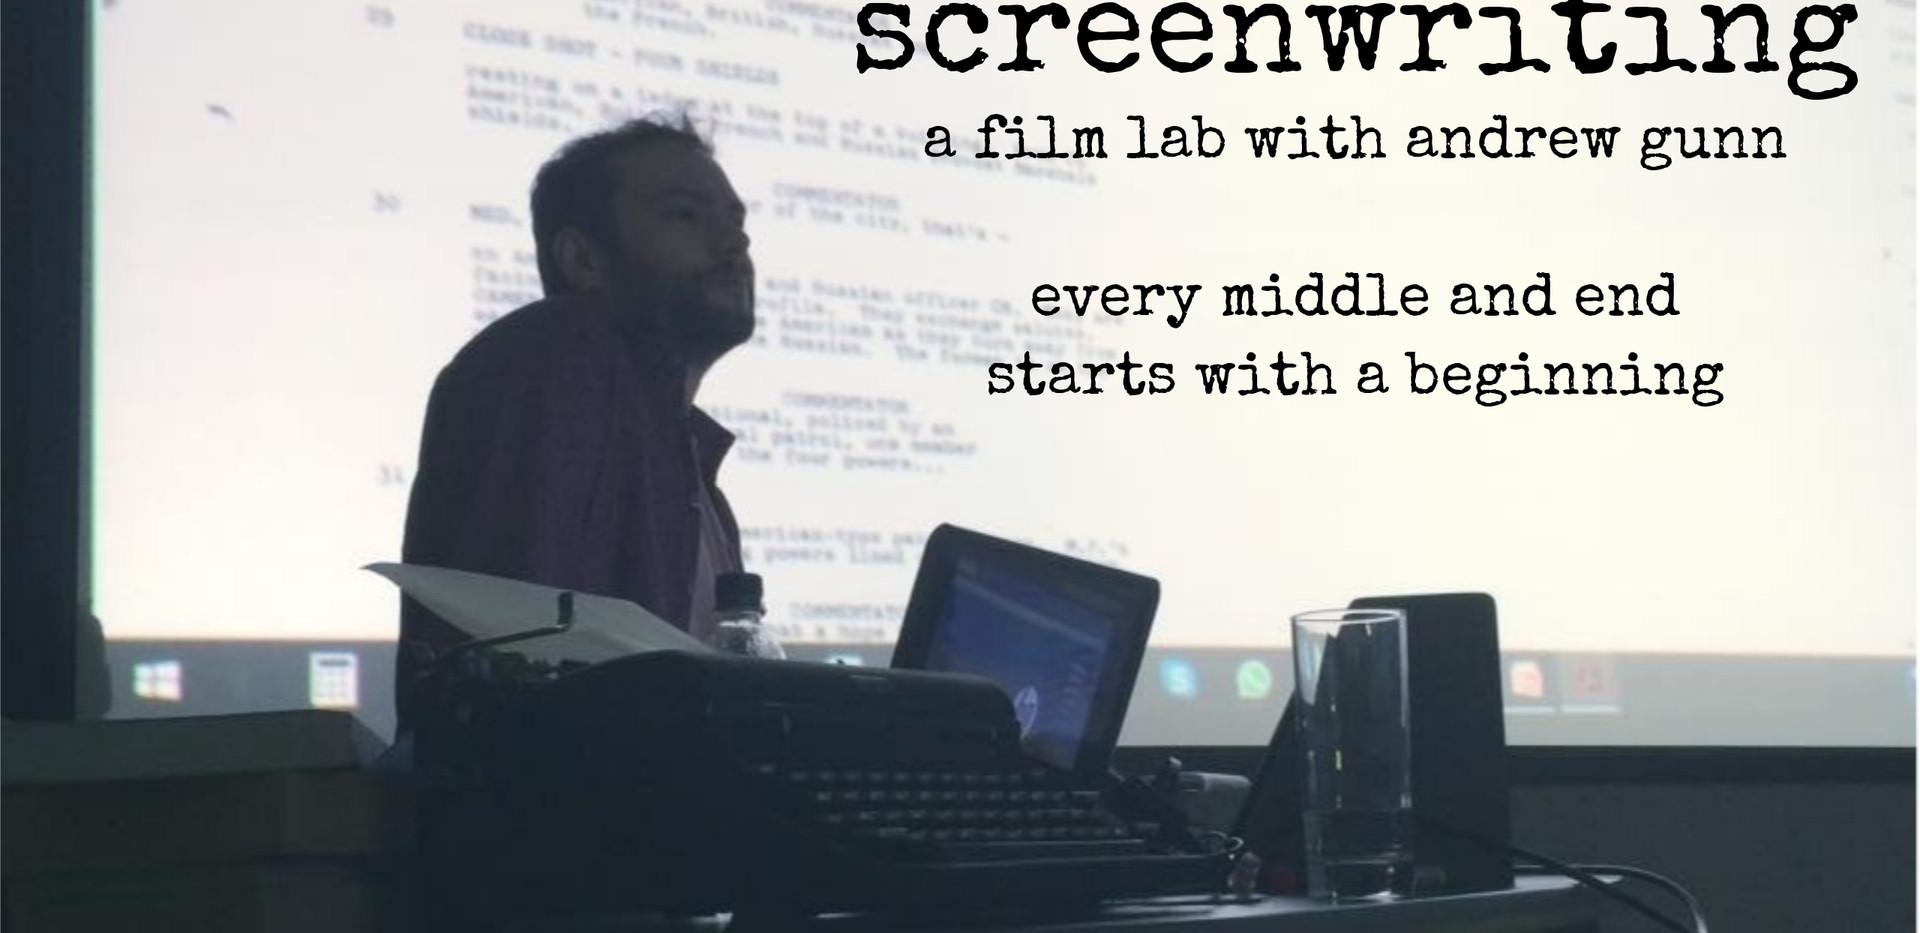 Screenwriting Film Lab